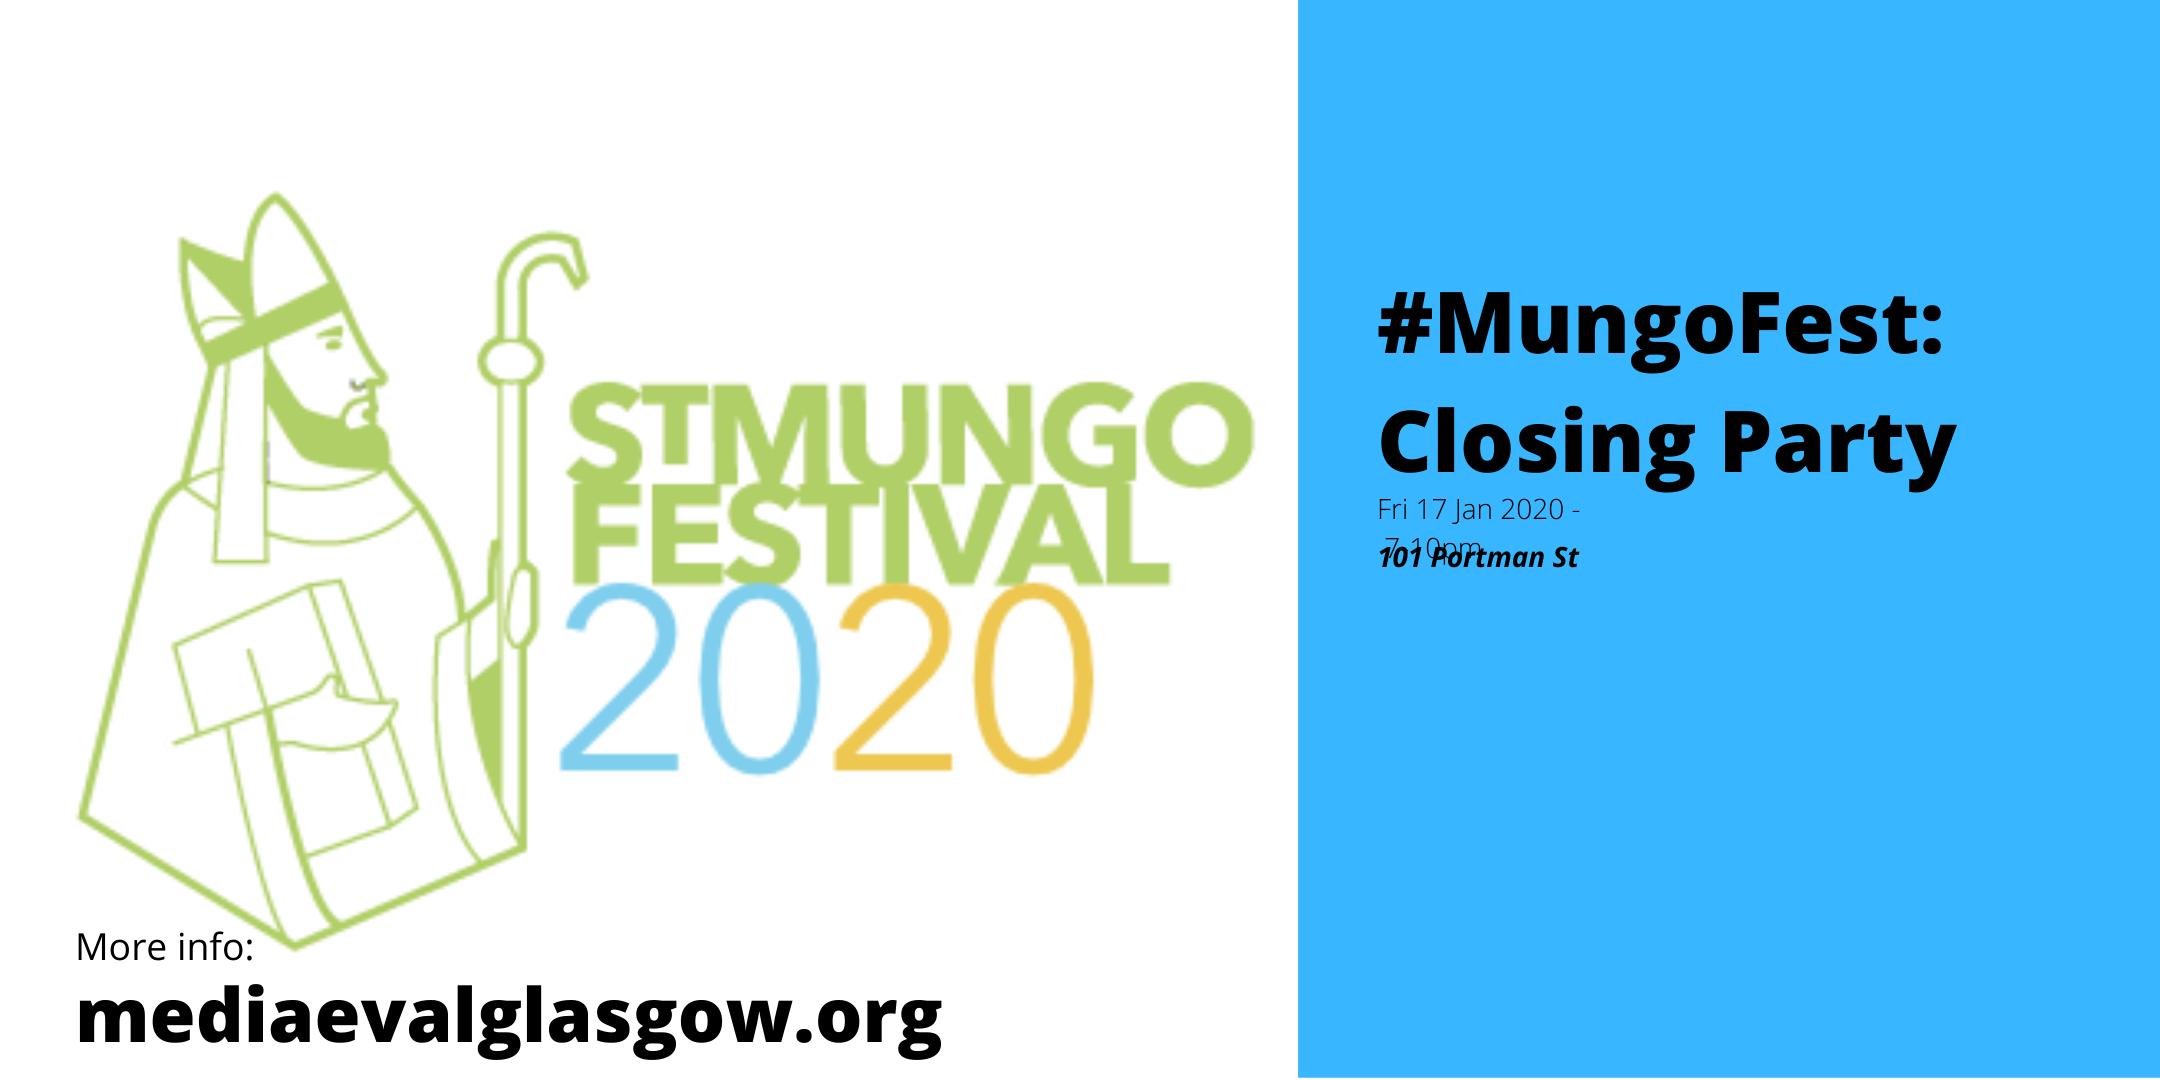 St Mungo 2020 - Closing Festival Event